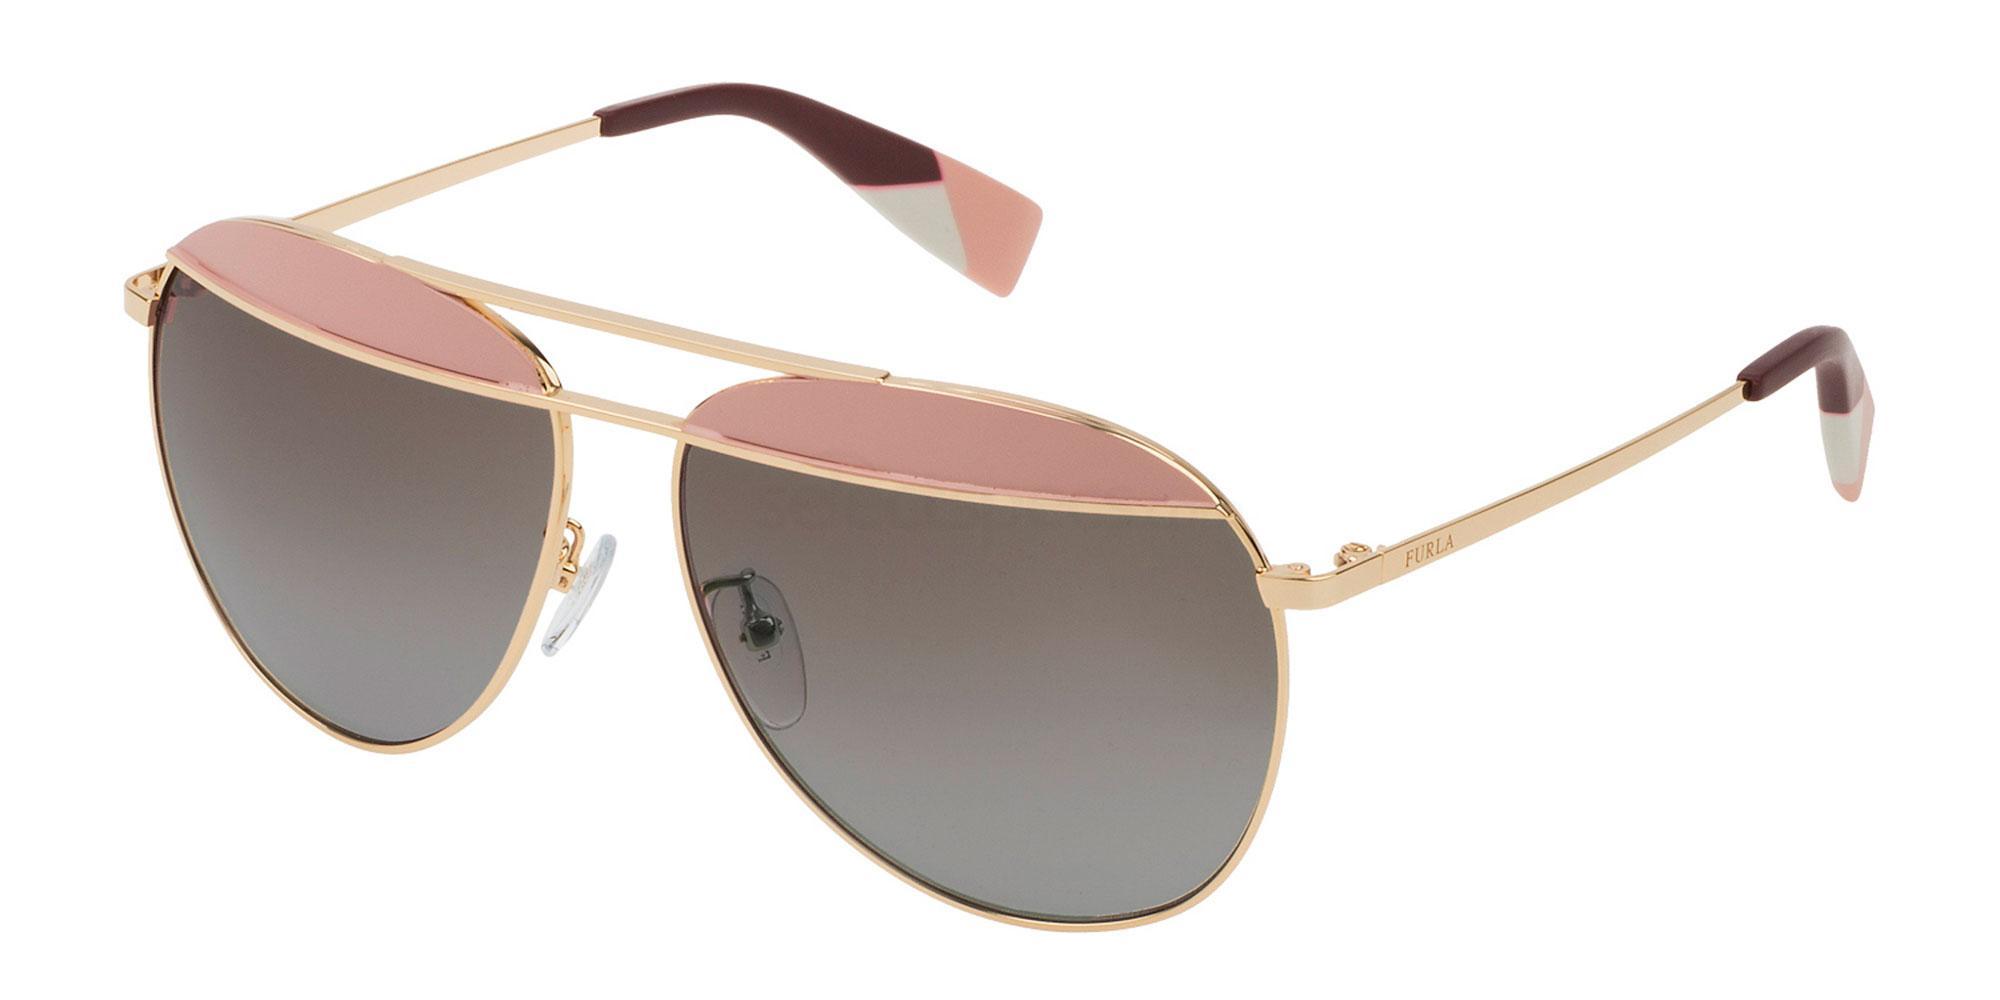 0323 SFU236 Sunglasses, Furla